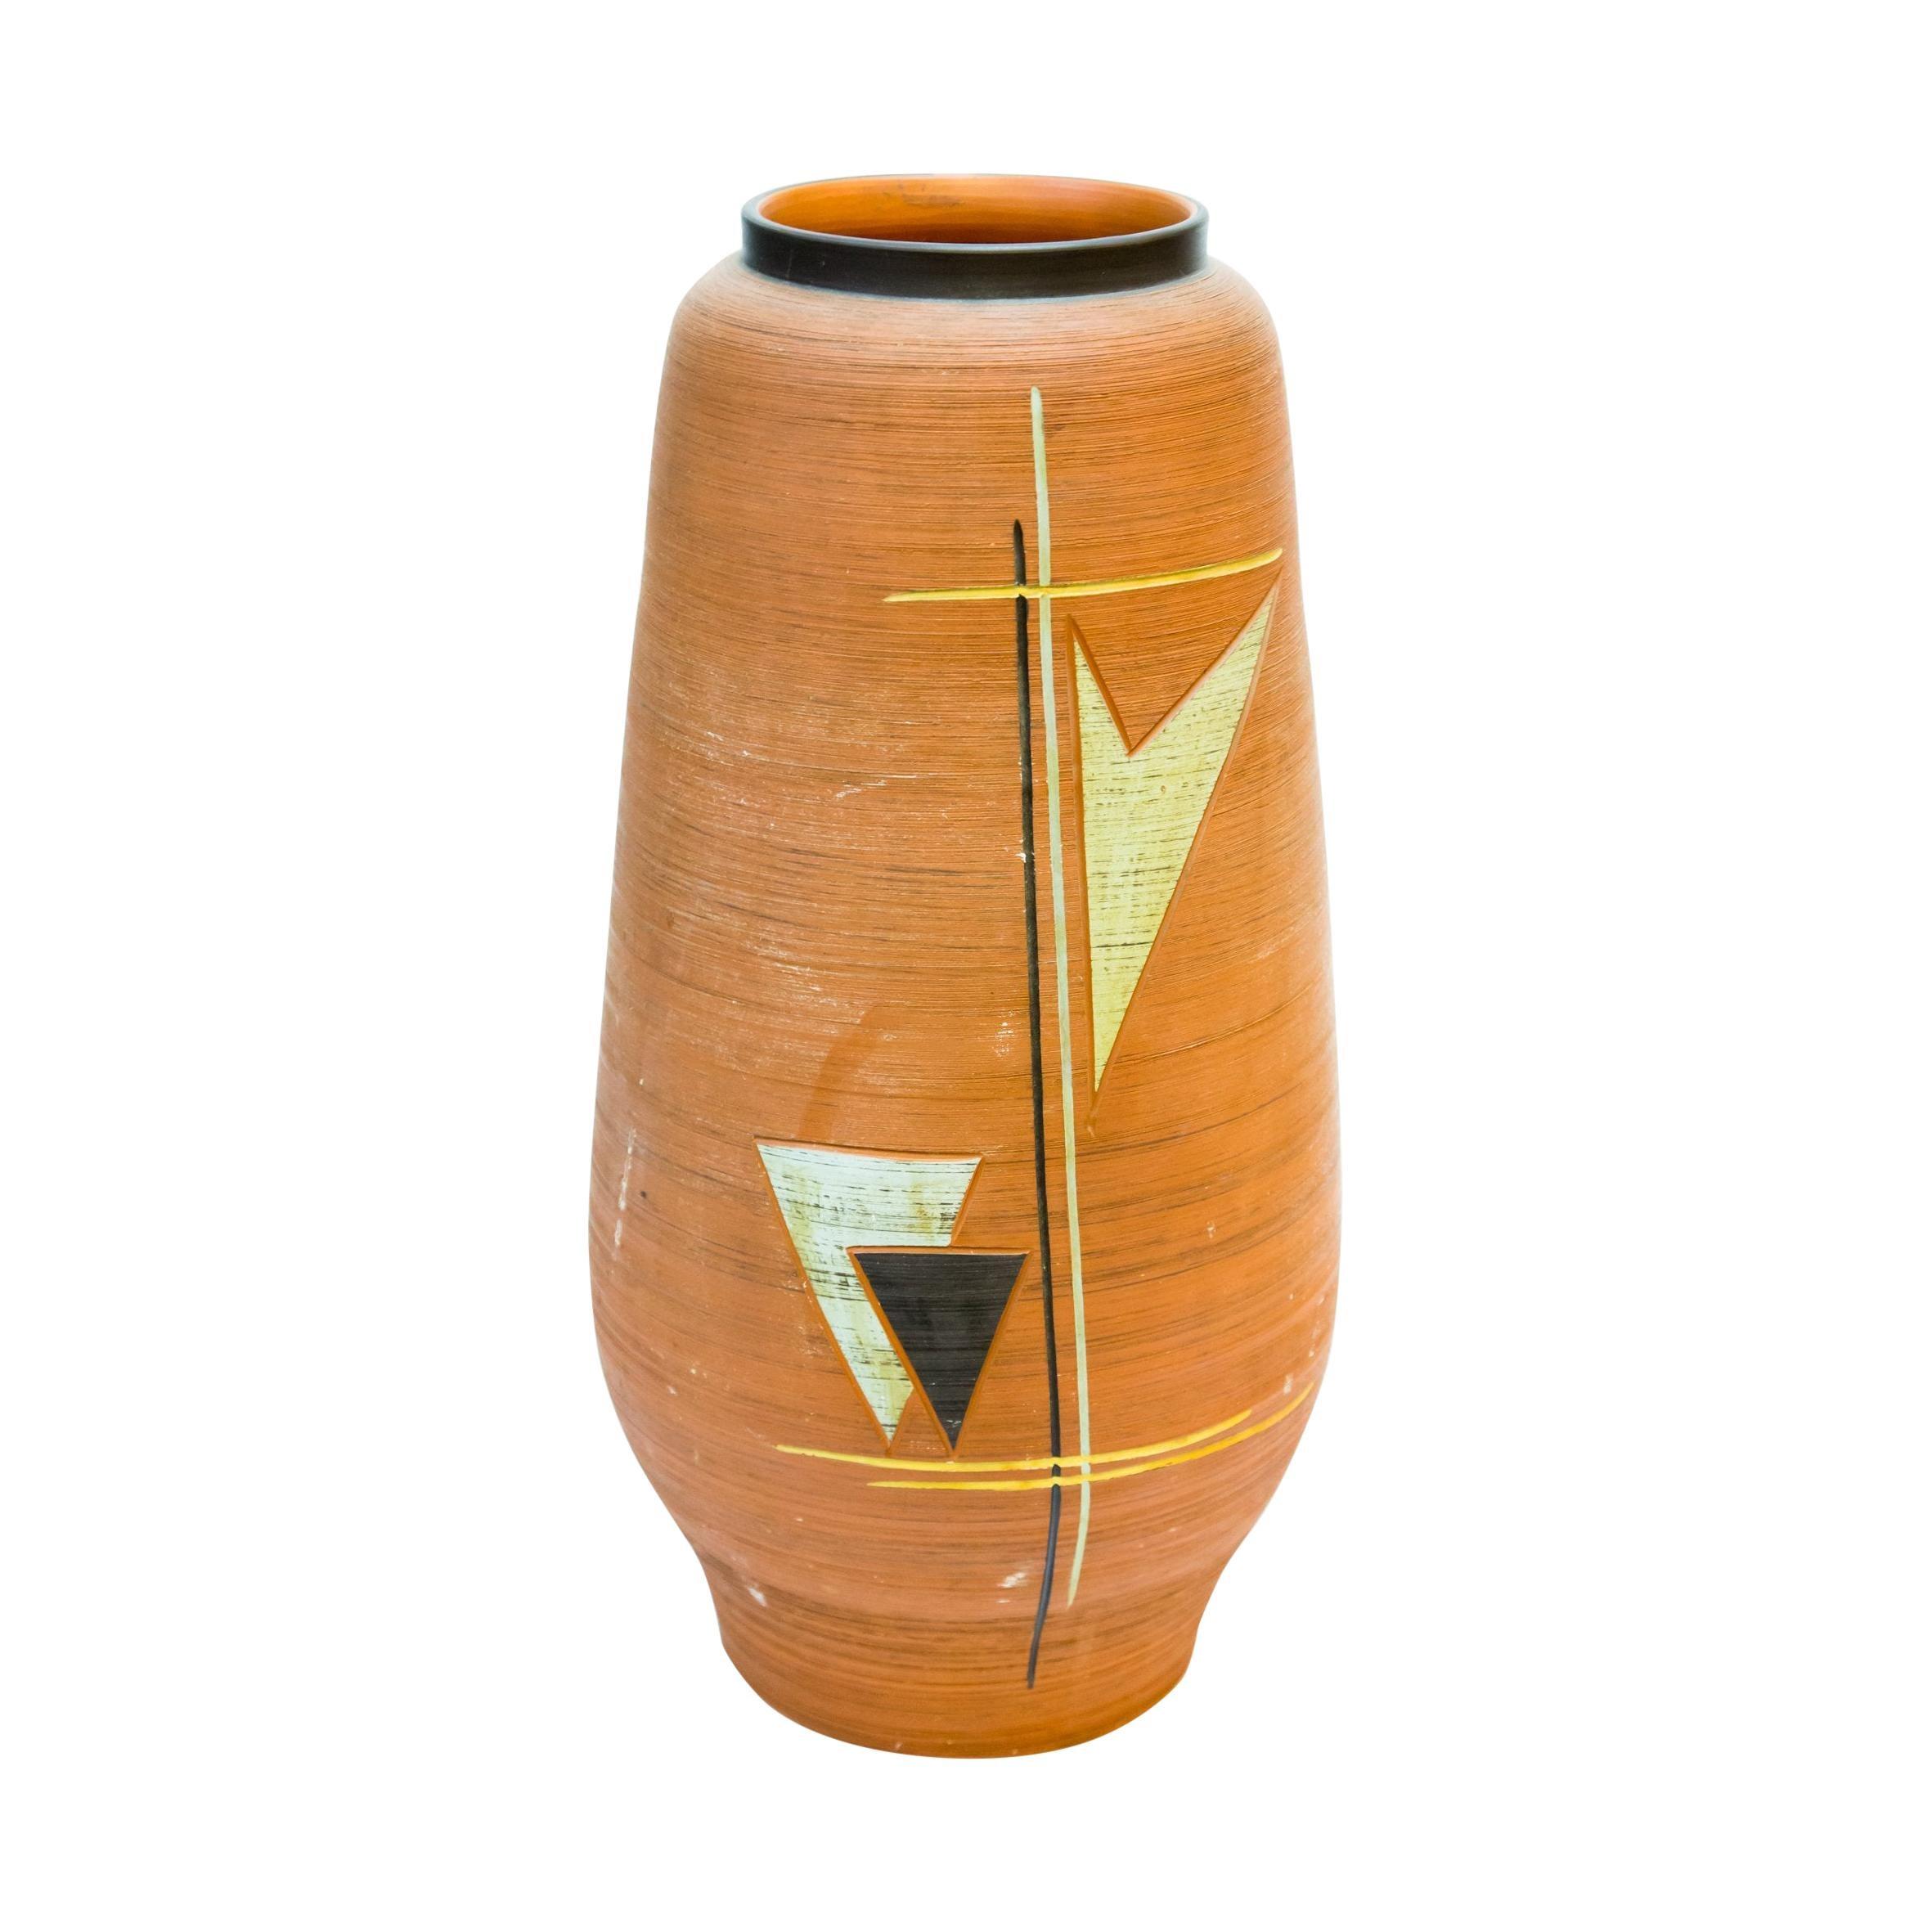 Handmade German 1960s Ceramic Floor Vase, 1960s